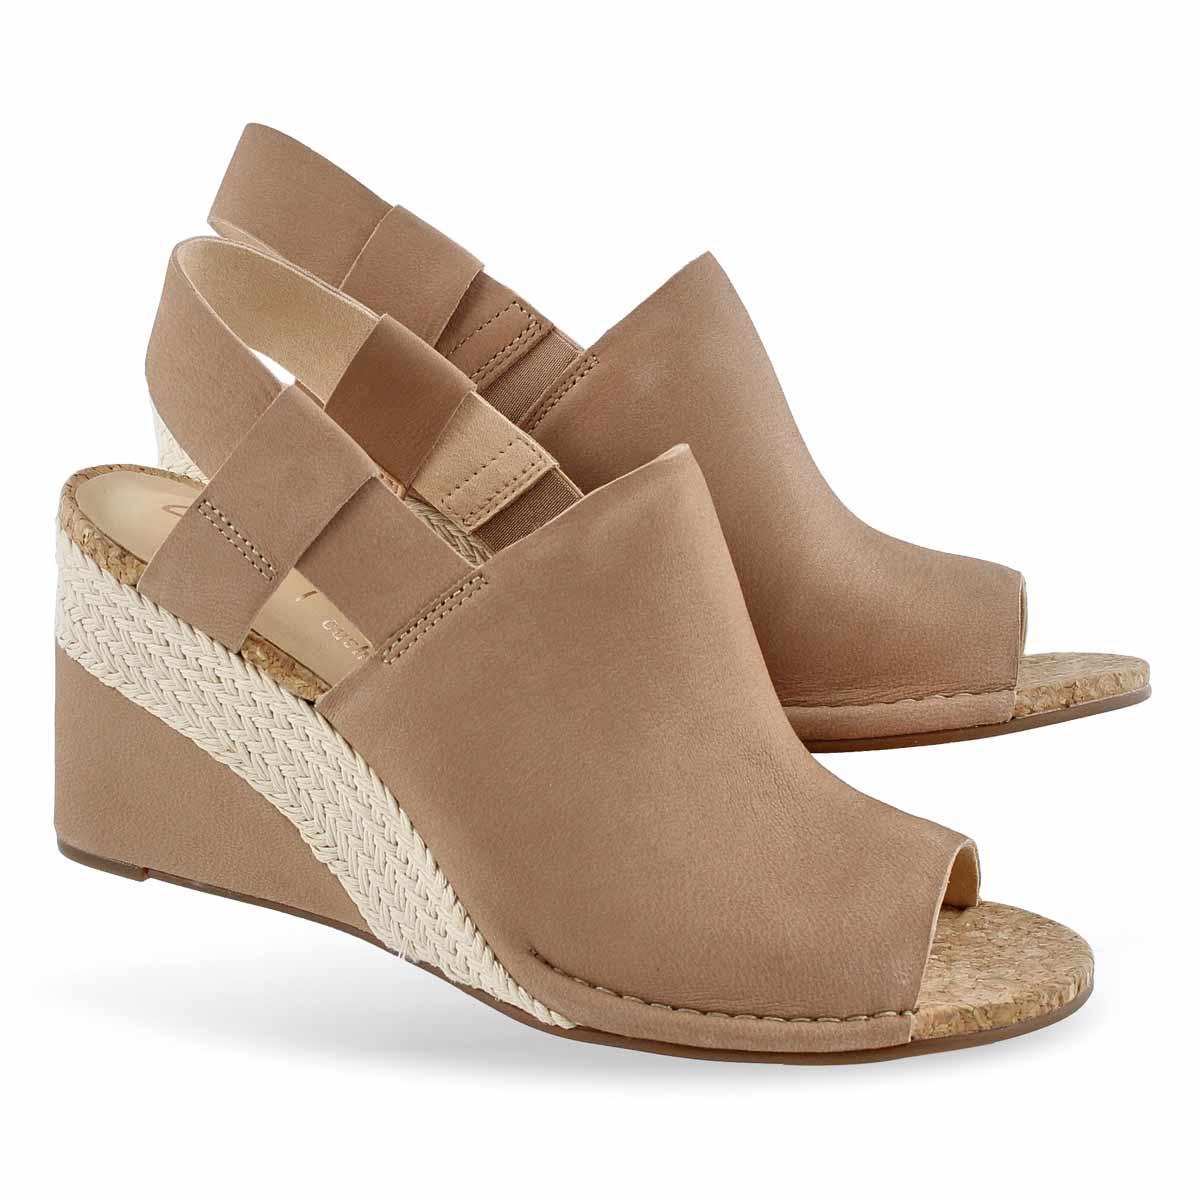 Lds Spiced Bay nude dress wedge sandal